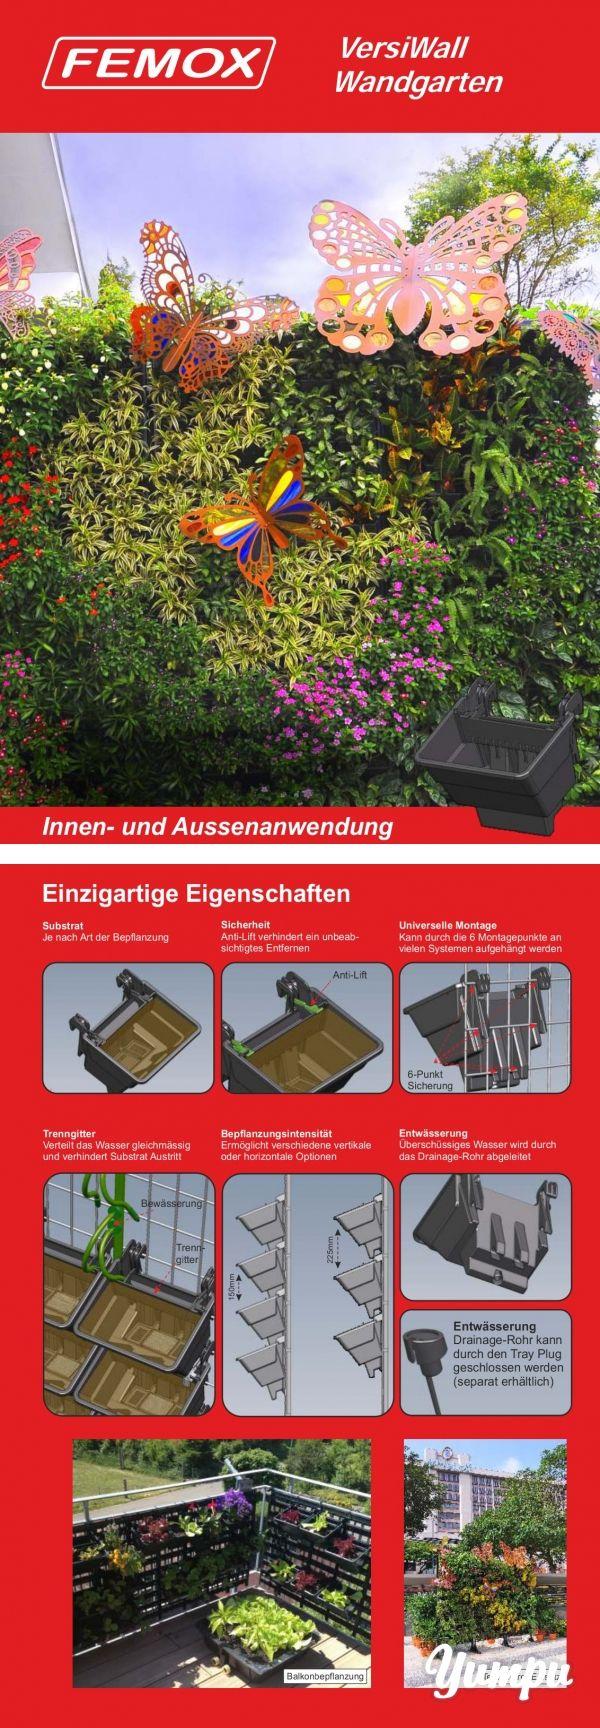 Fancy femox versiwall wandgarten galabau produkte de Magazine with pages Versiwall Wandgarten